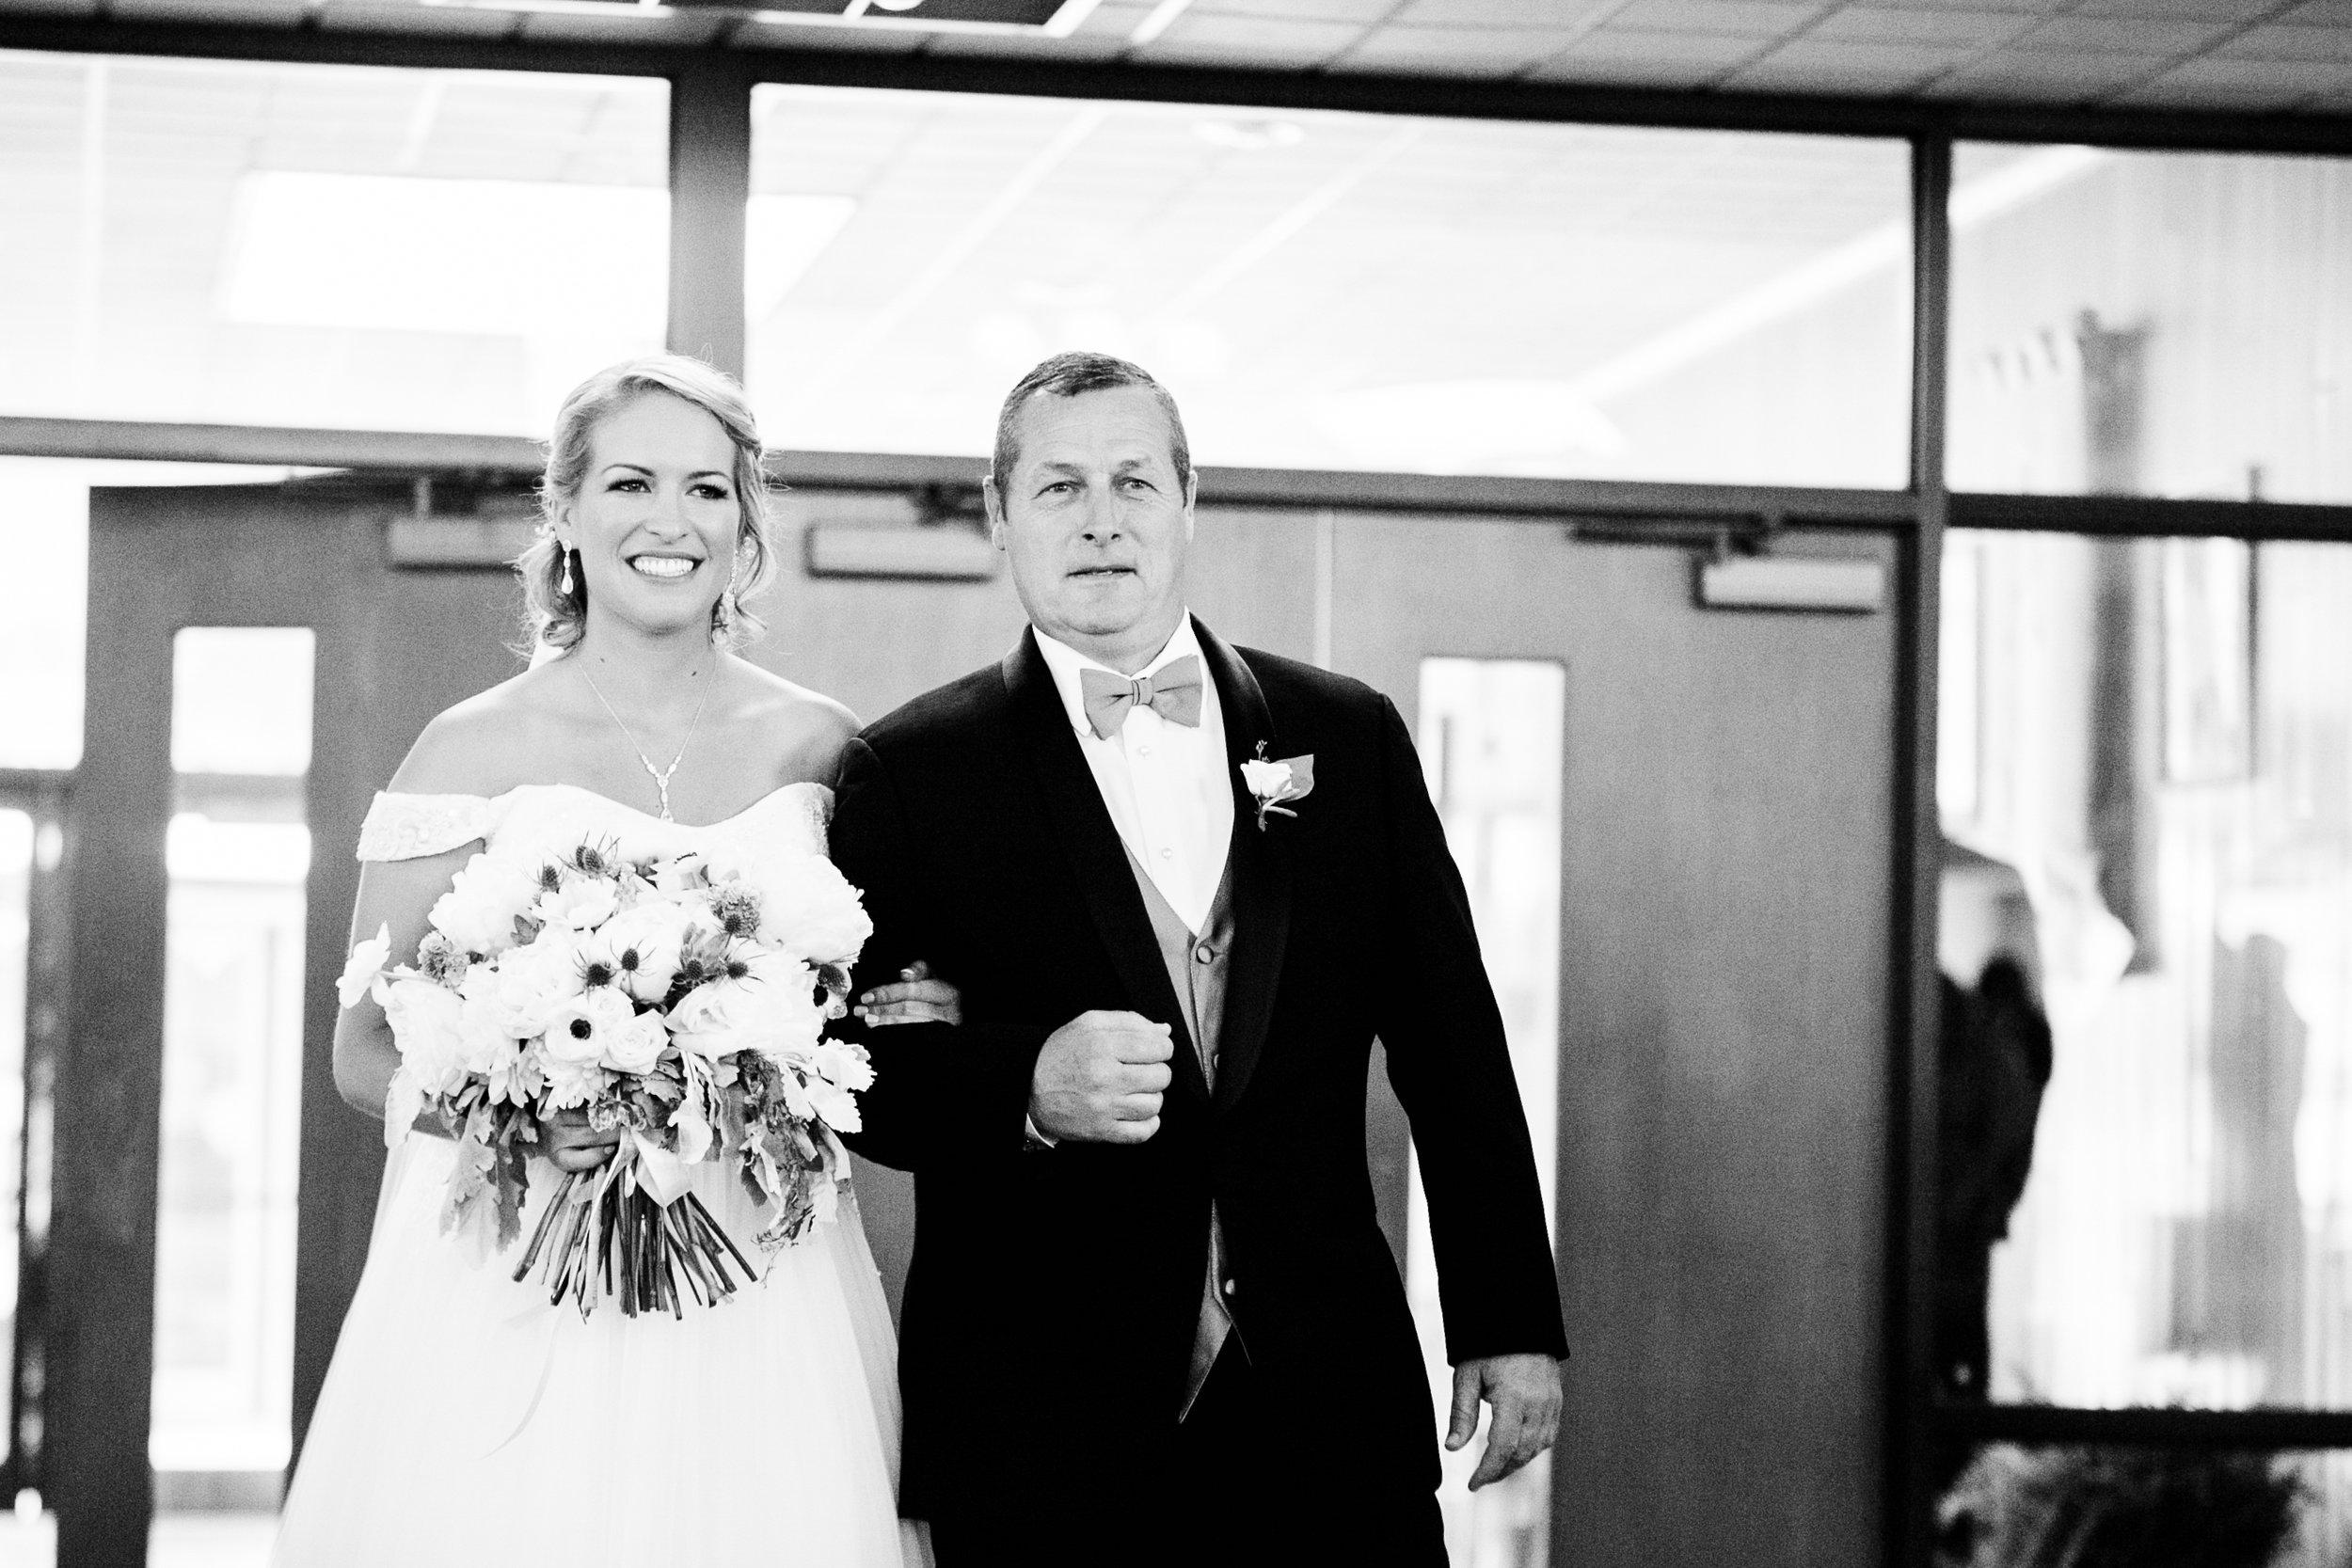 ICONA GOLDEN INN AVALON NJ WEDDING PHOTOGRAPHY  - 038.jpg